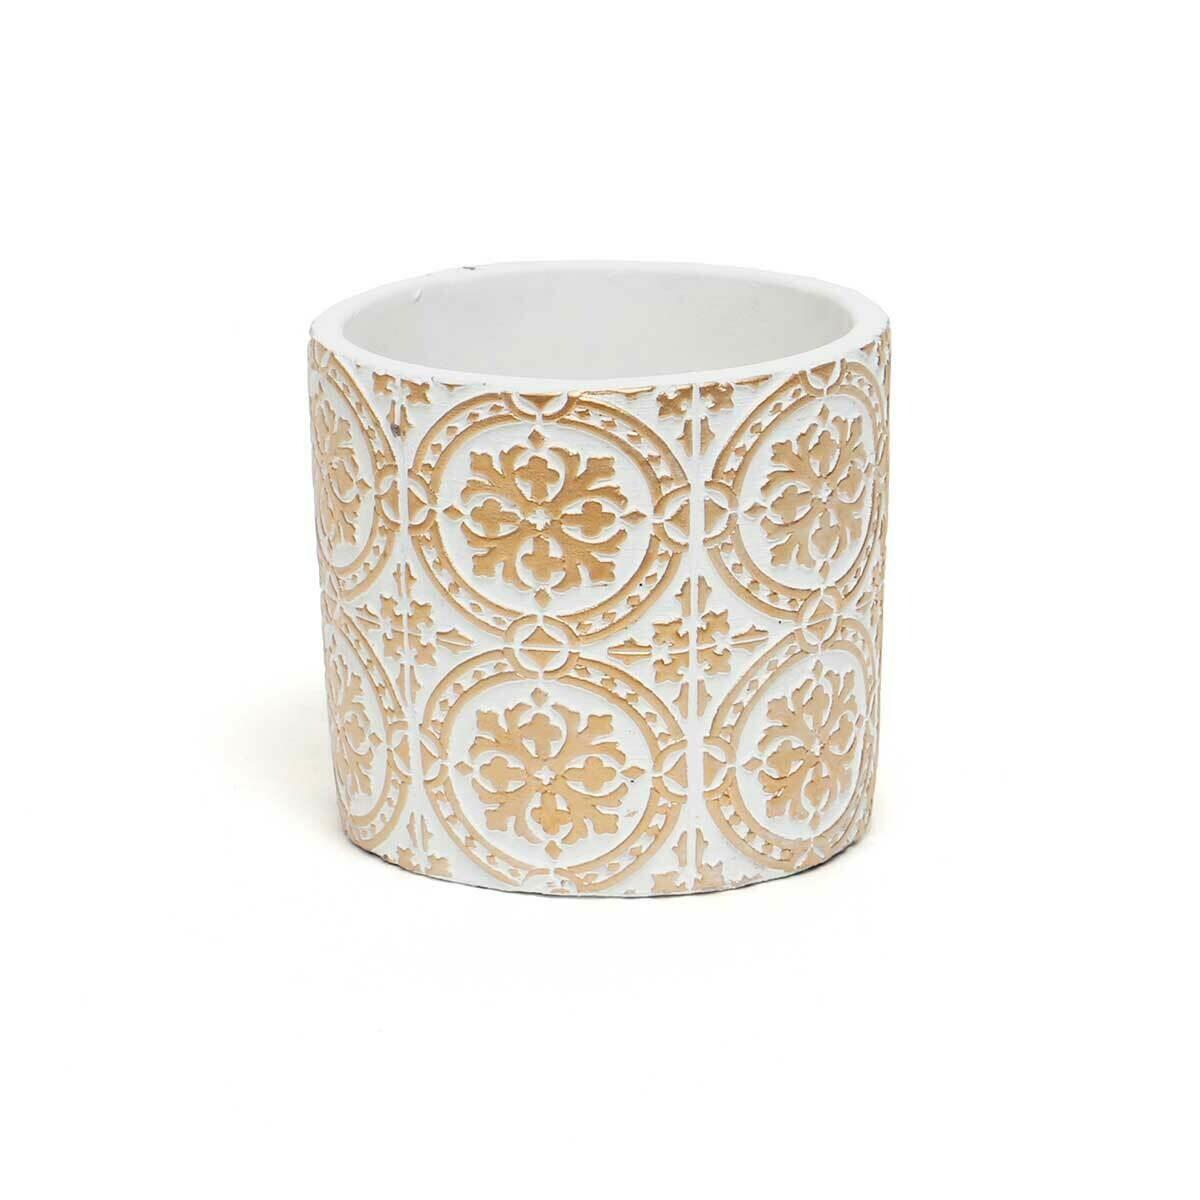 "Snowflake Concrete Pot - White & Beige - Small - 4.5""H x4.25"""